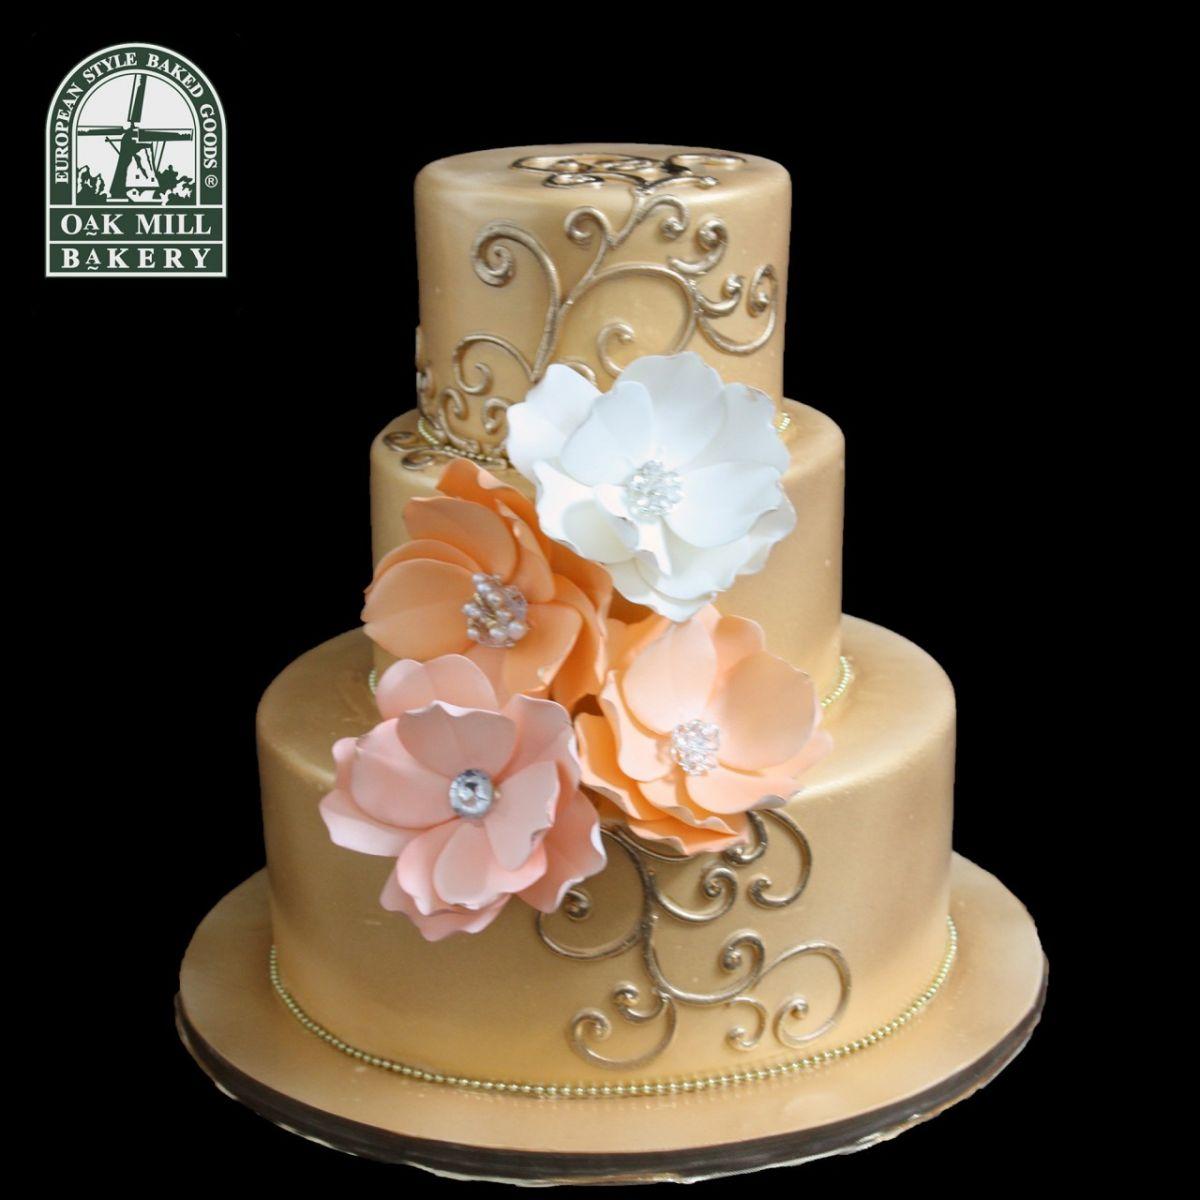 18 Wedding Cake Designs To Steal Allfreediyweddings Com